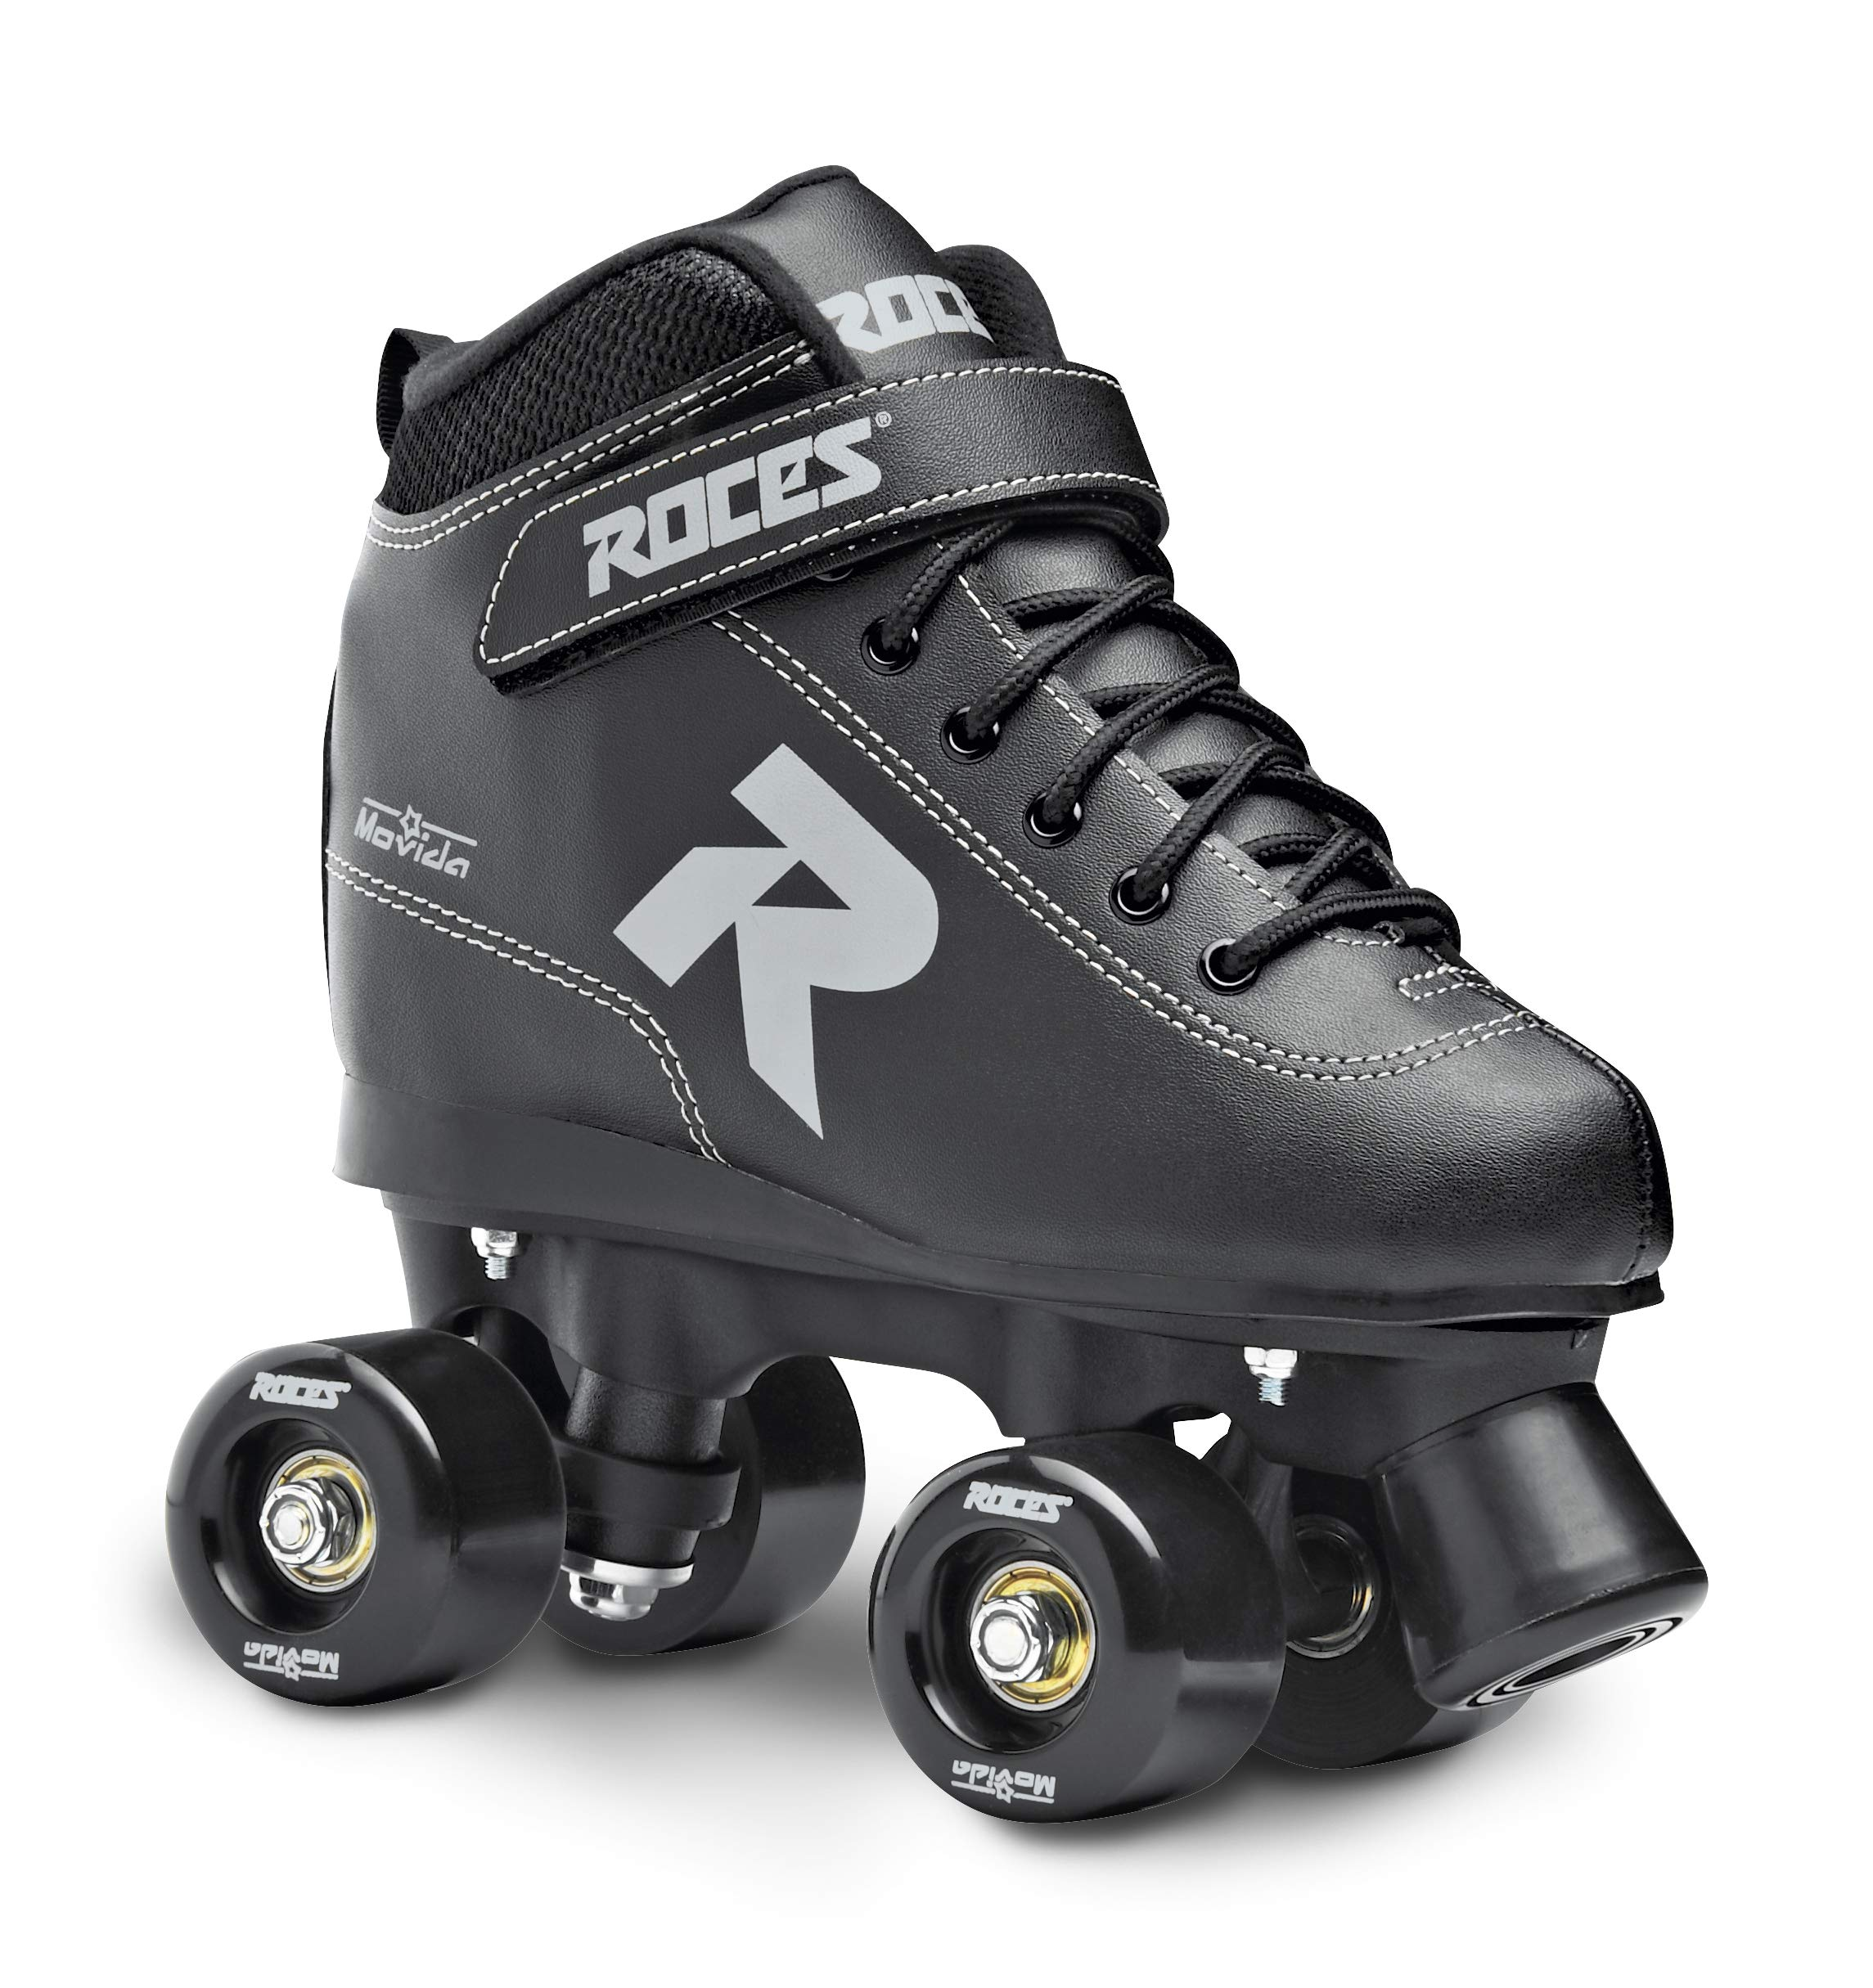 Roces 550068 Model Movida UP Roller Skate, US 10M/12W, Black